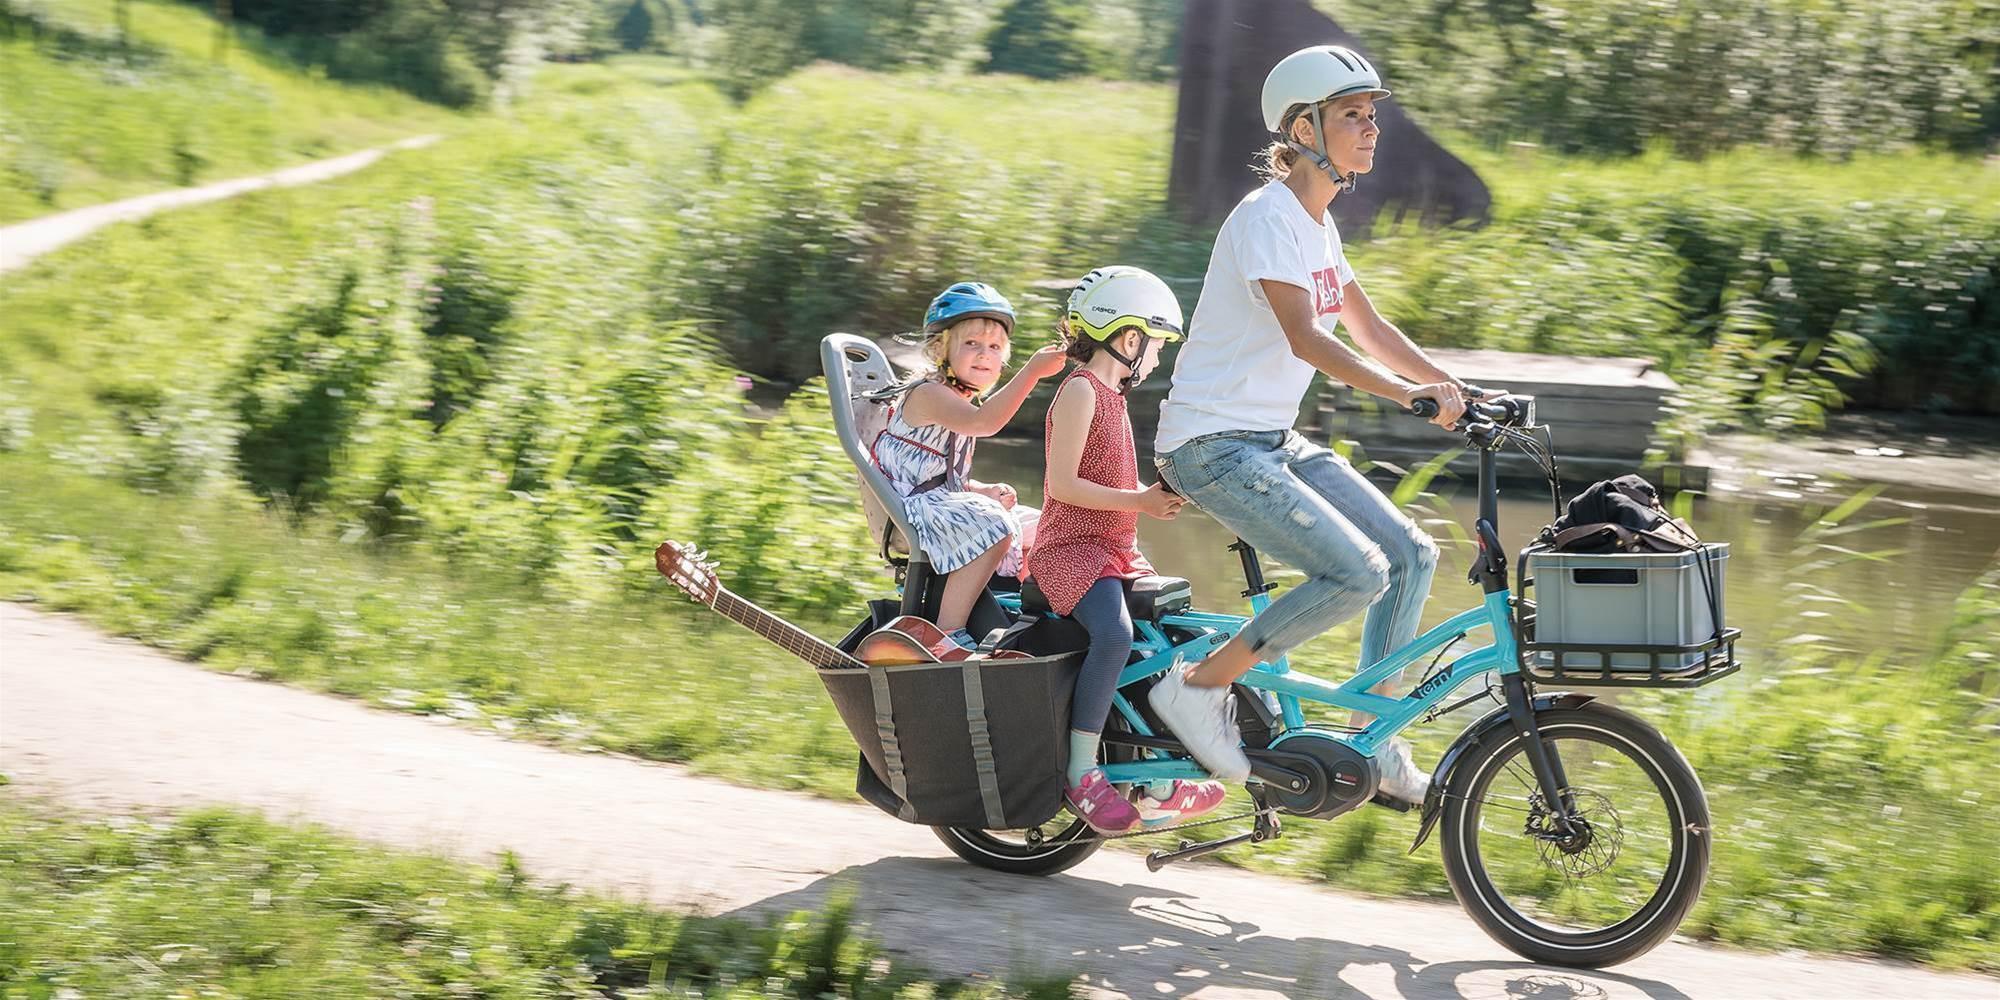 Tern's newest E-bike upgrades family bike adventures